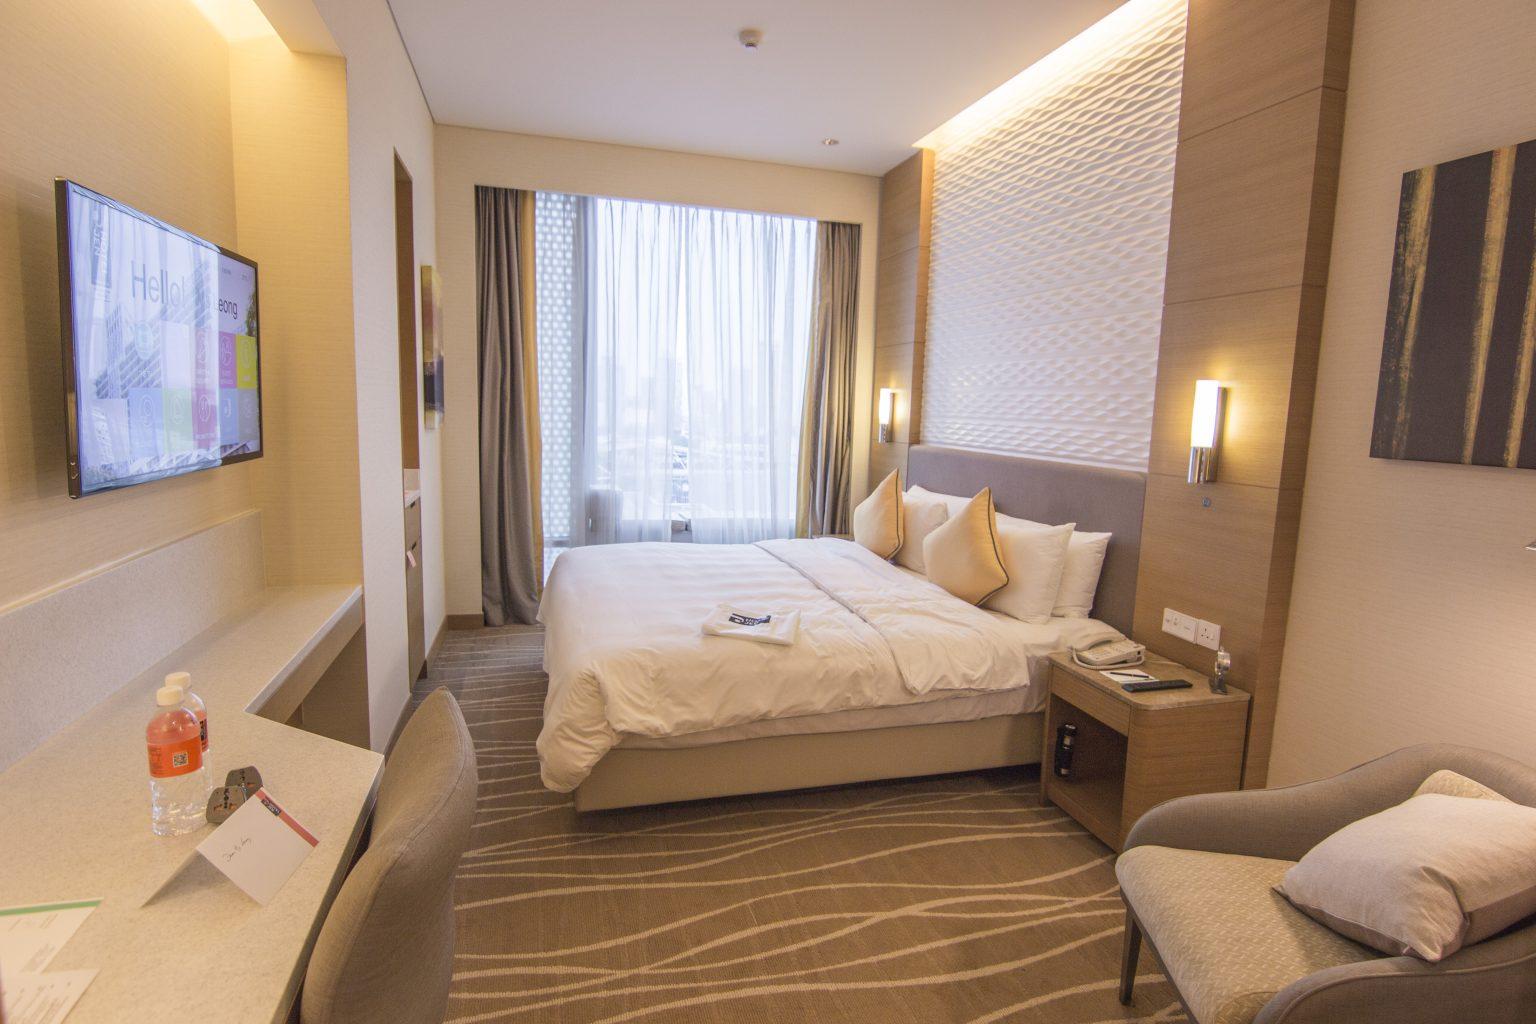 Hotel Jen Orchardgateway Singapore Hotel Review Bel